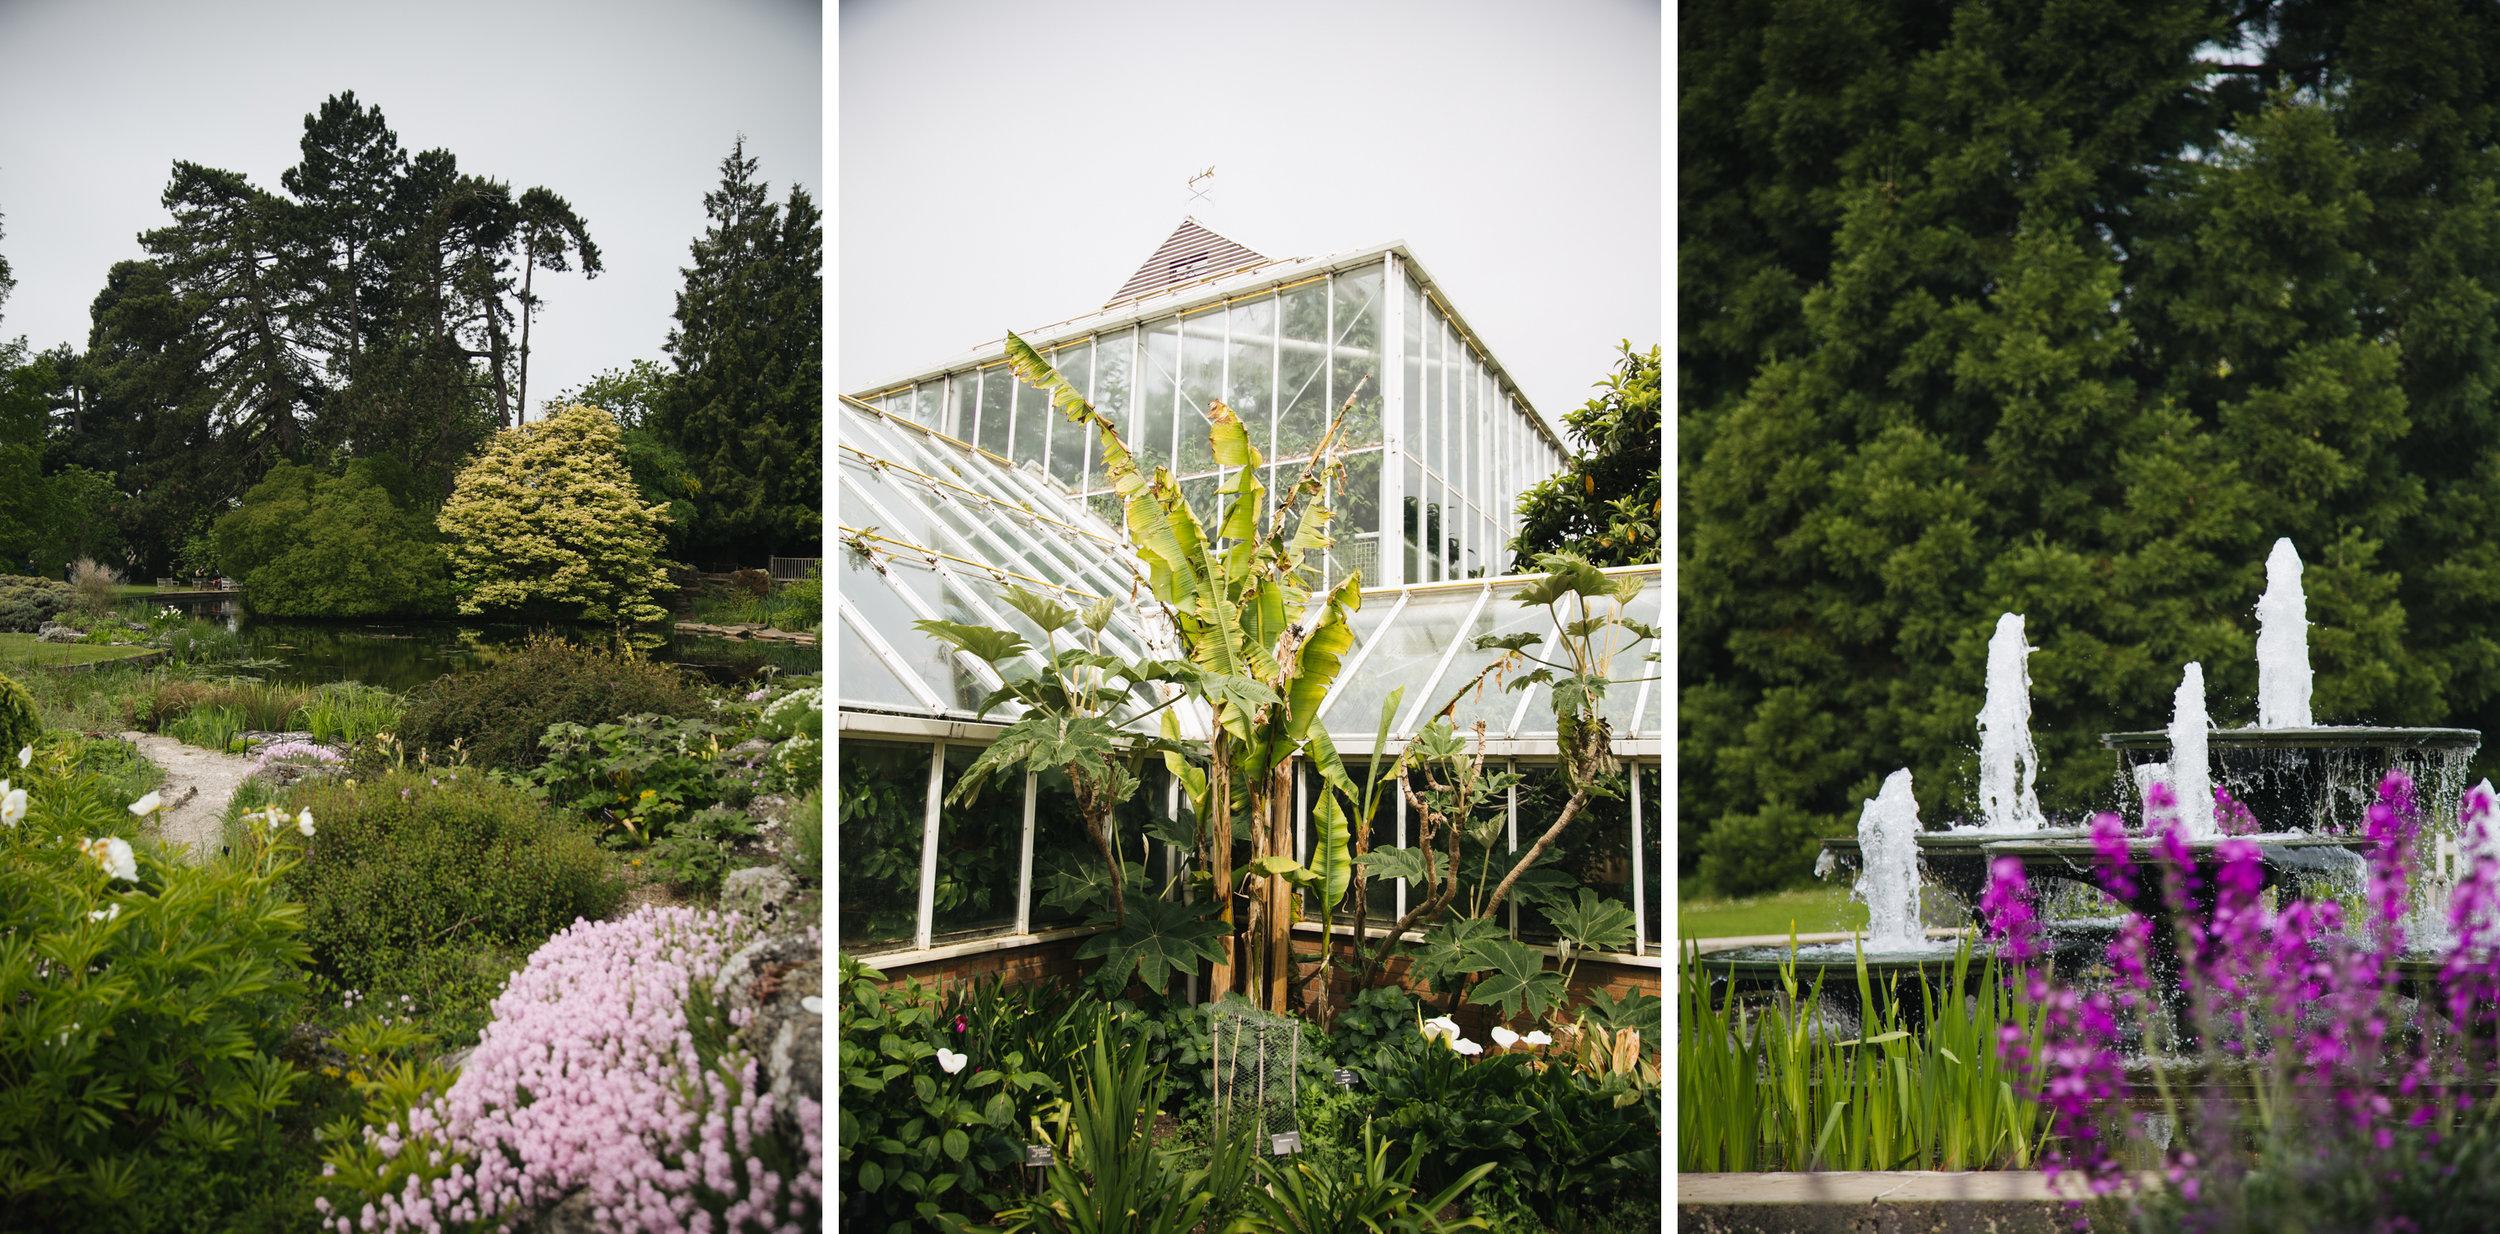 Jardin-botanique-blog-voyage-onmyway-cambridge.jpg